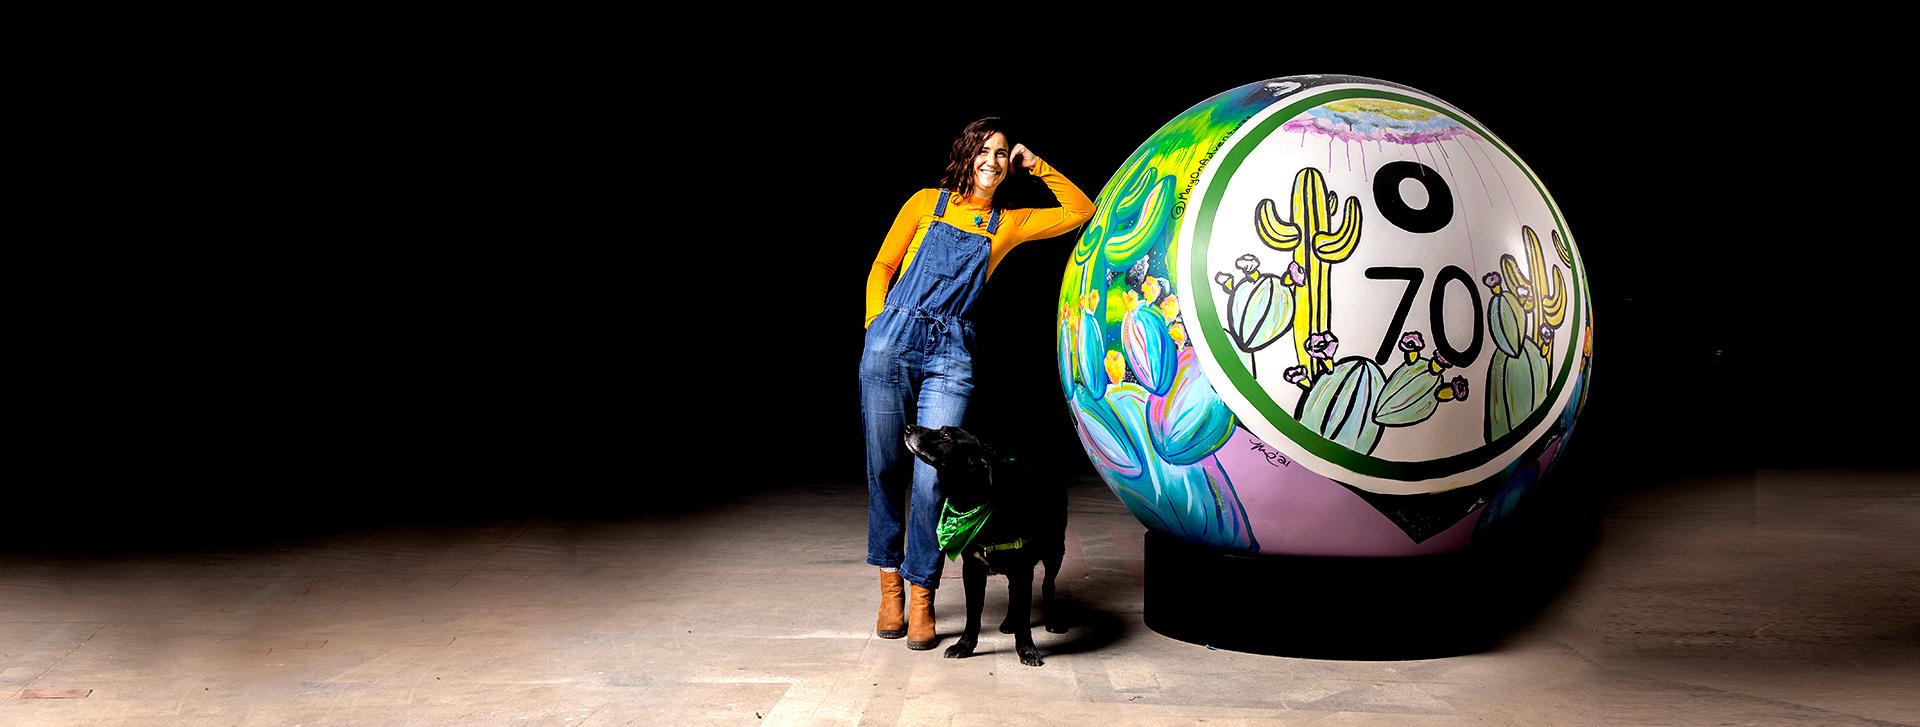 woman and dog with giant bingo ball